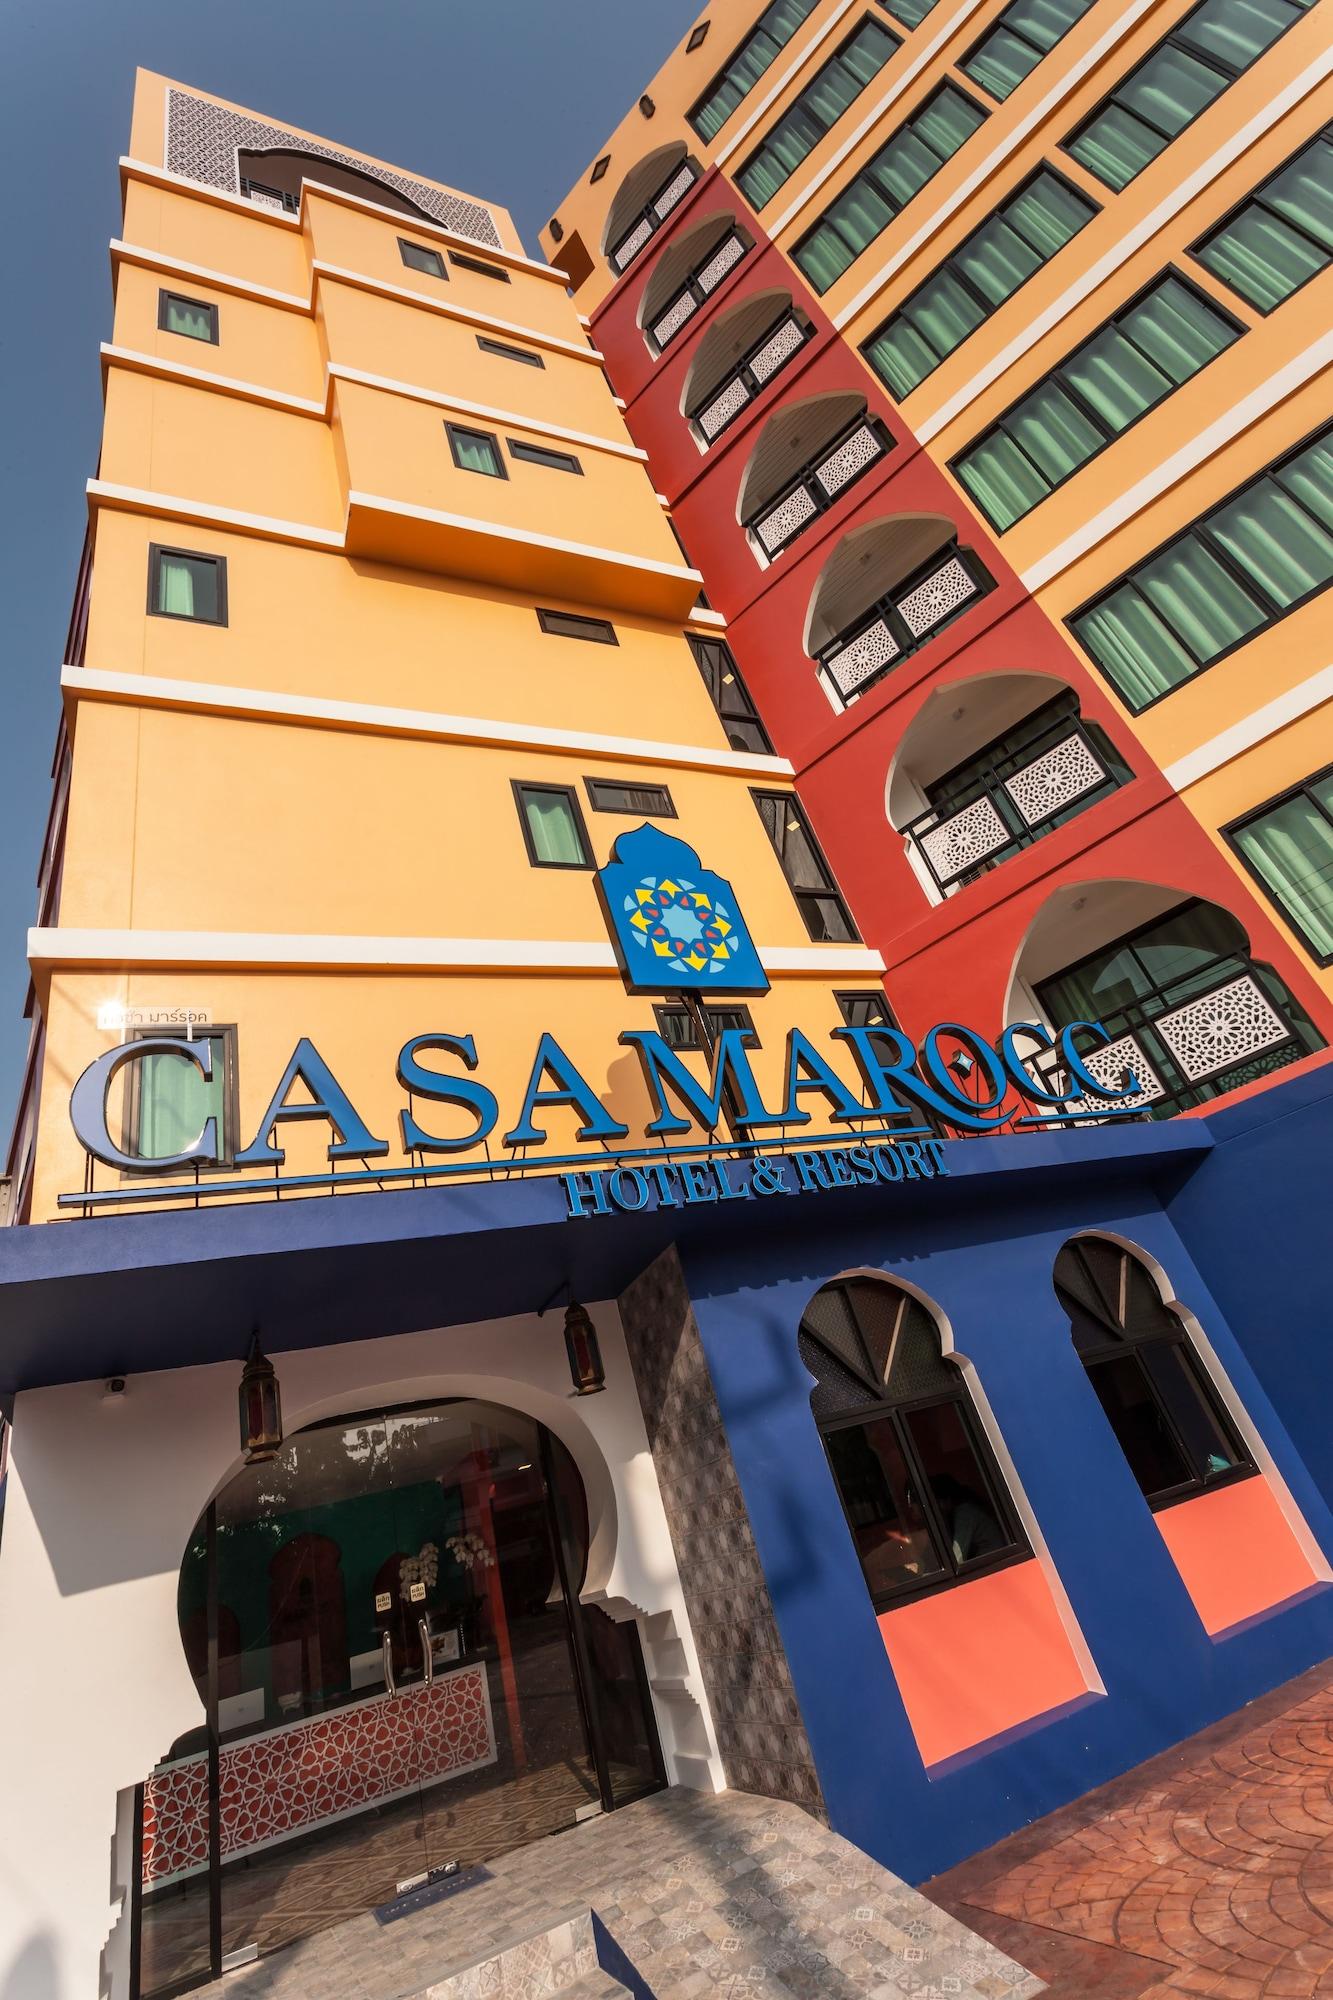 Casa Marocc Hotel by Andacura, Muang Chiang Mai